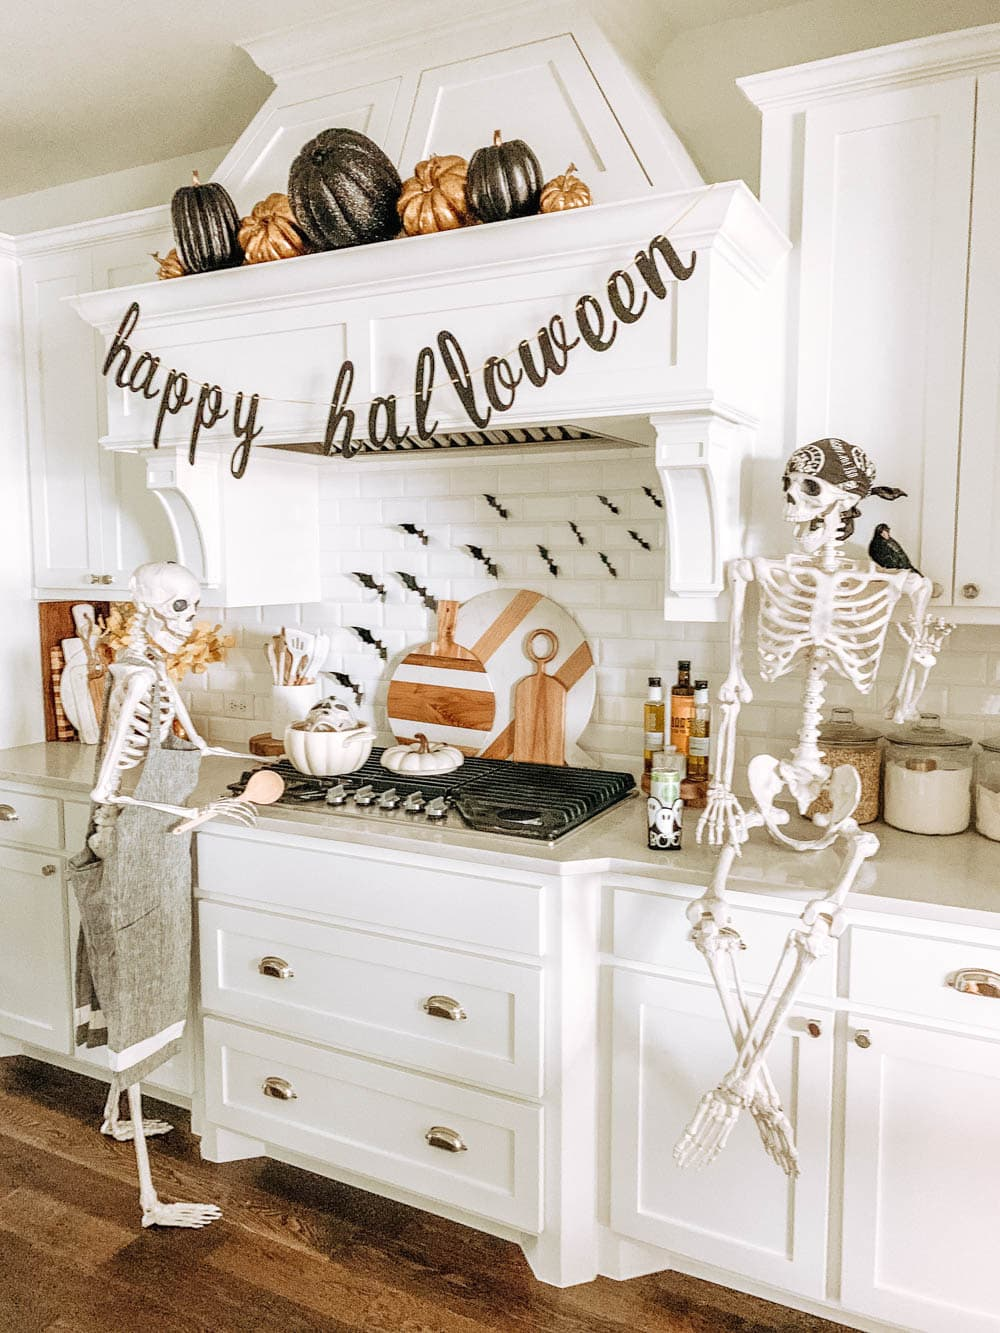 Last Minute Fun and Spooky Halloween Decor